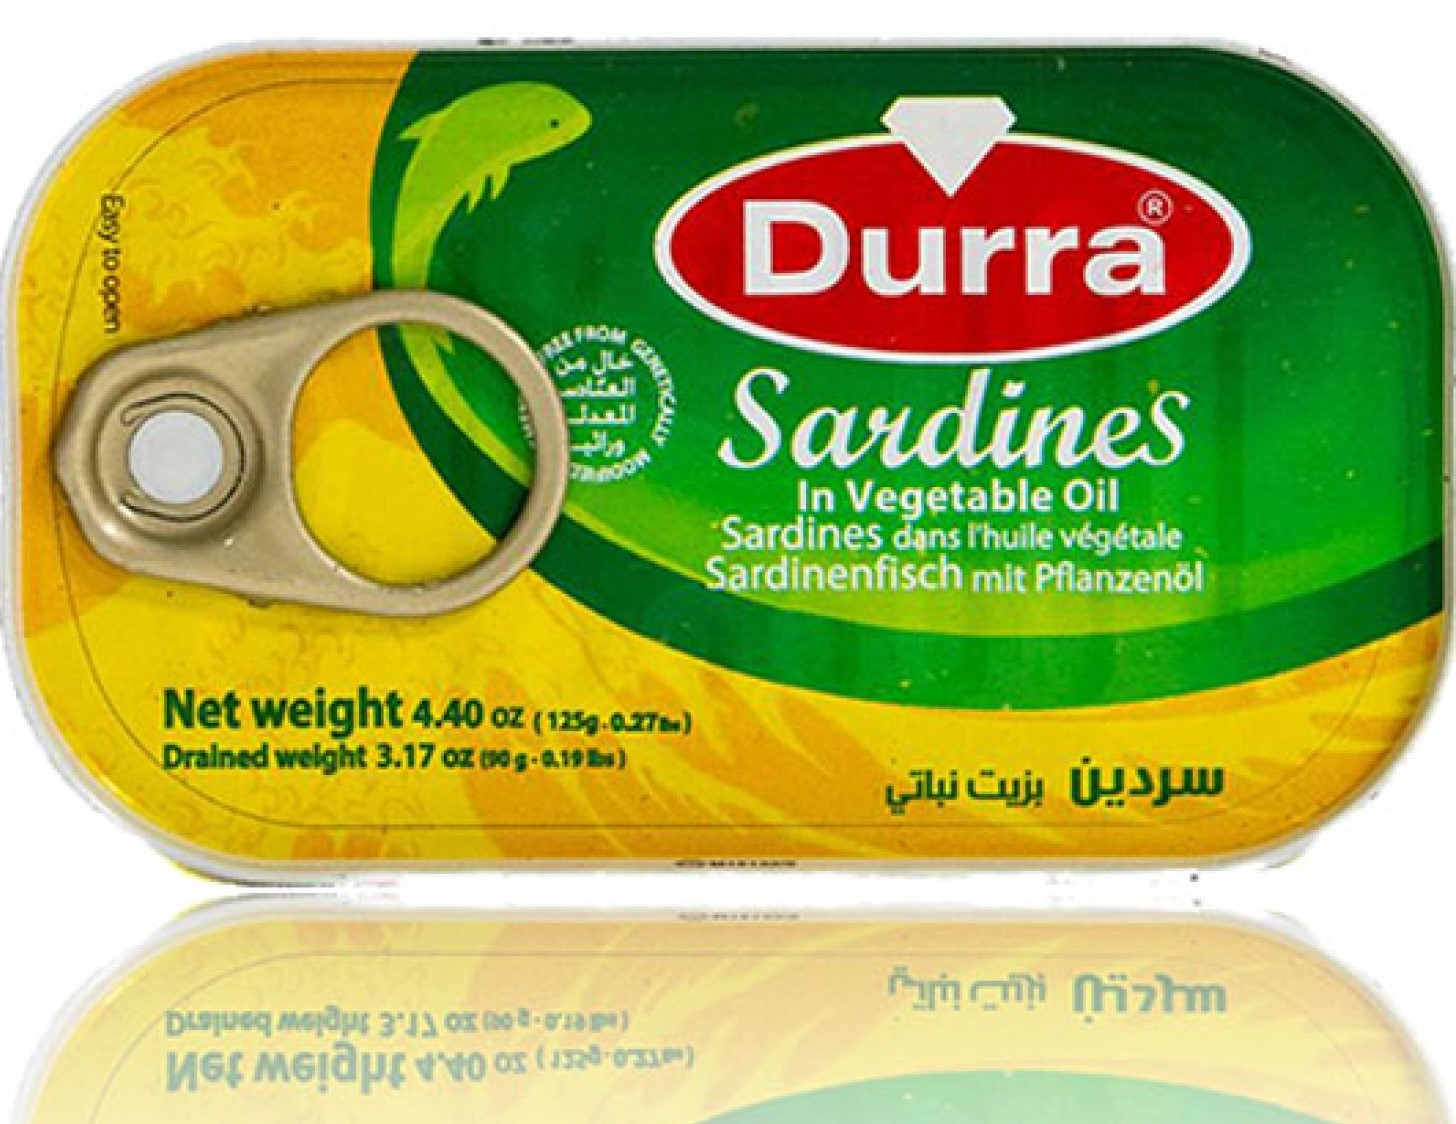 Durra Sardines in Pflanzenöl 125g سردين  بالزيت النباتي الدرة